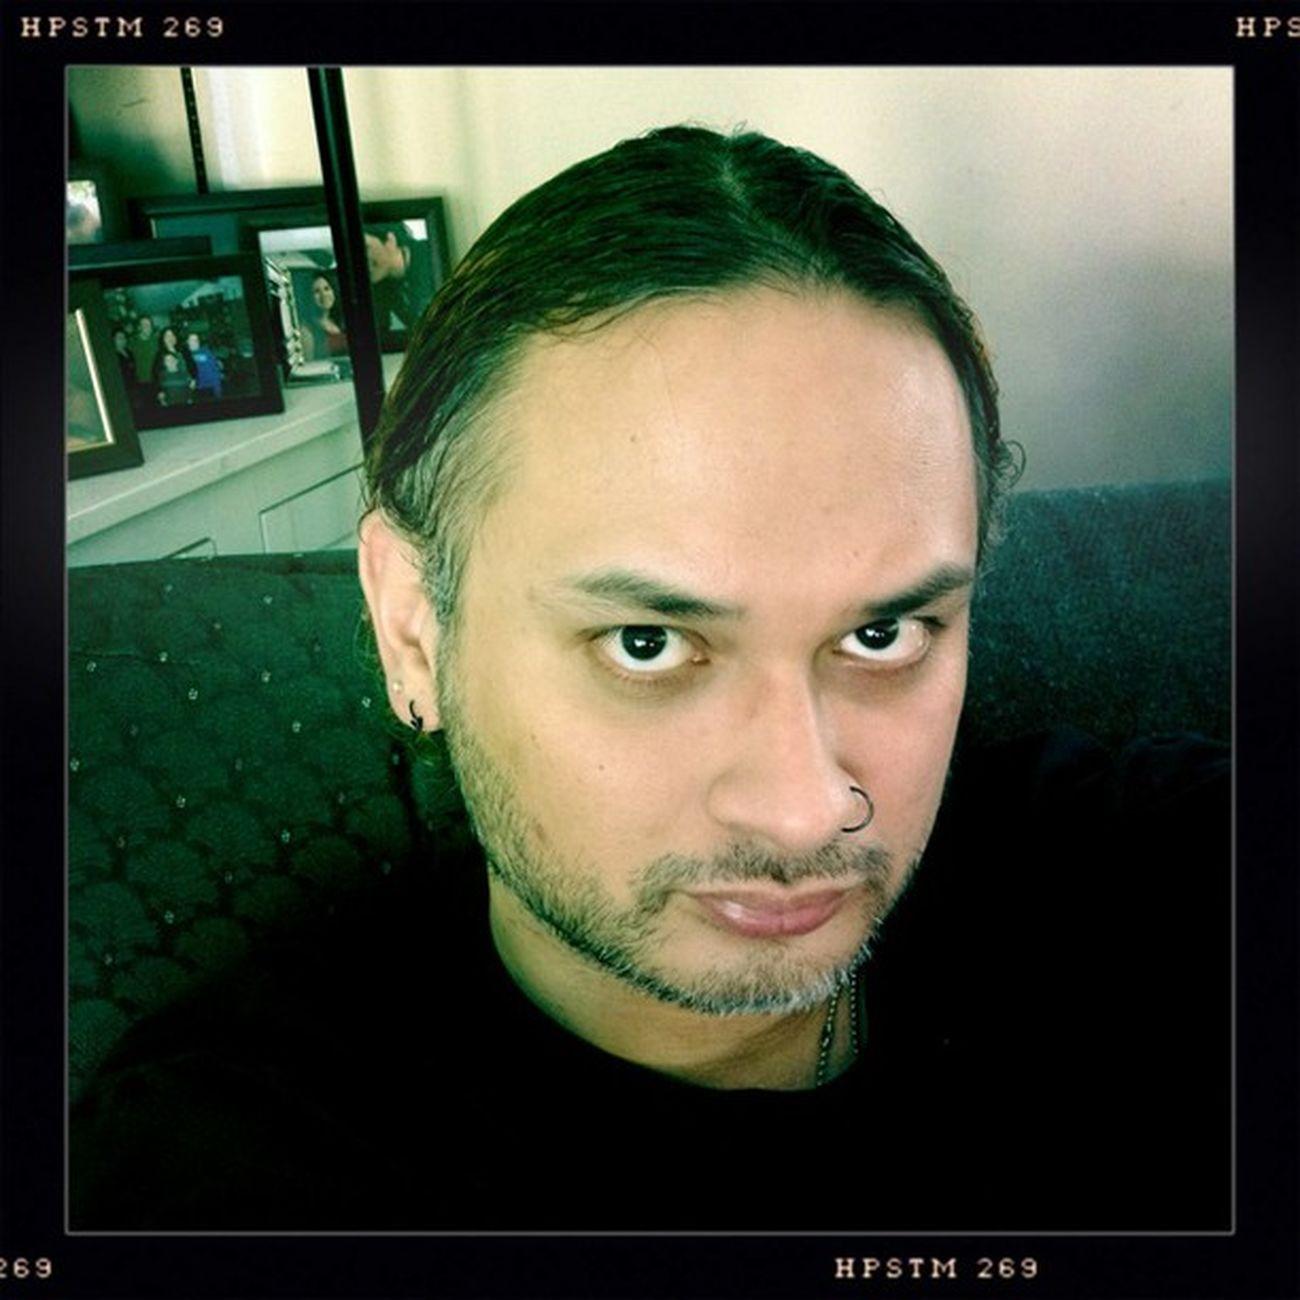 Some creepy guy... Hipstamatic Johns Pistil